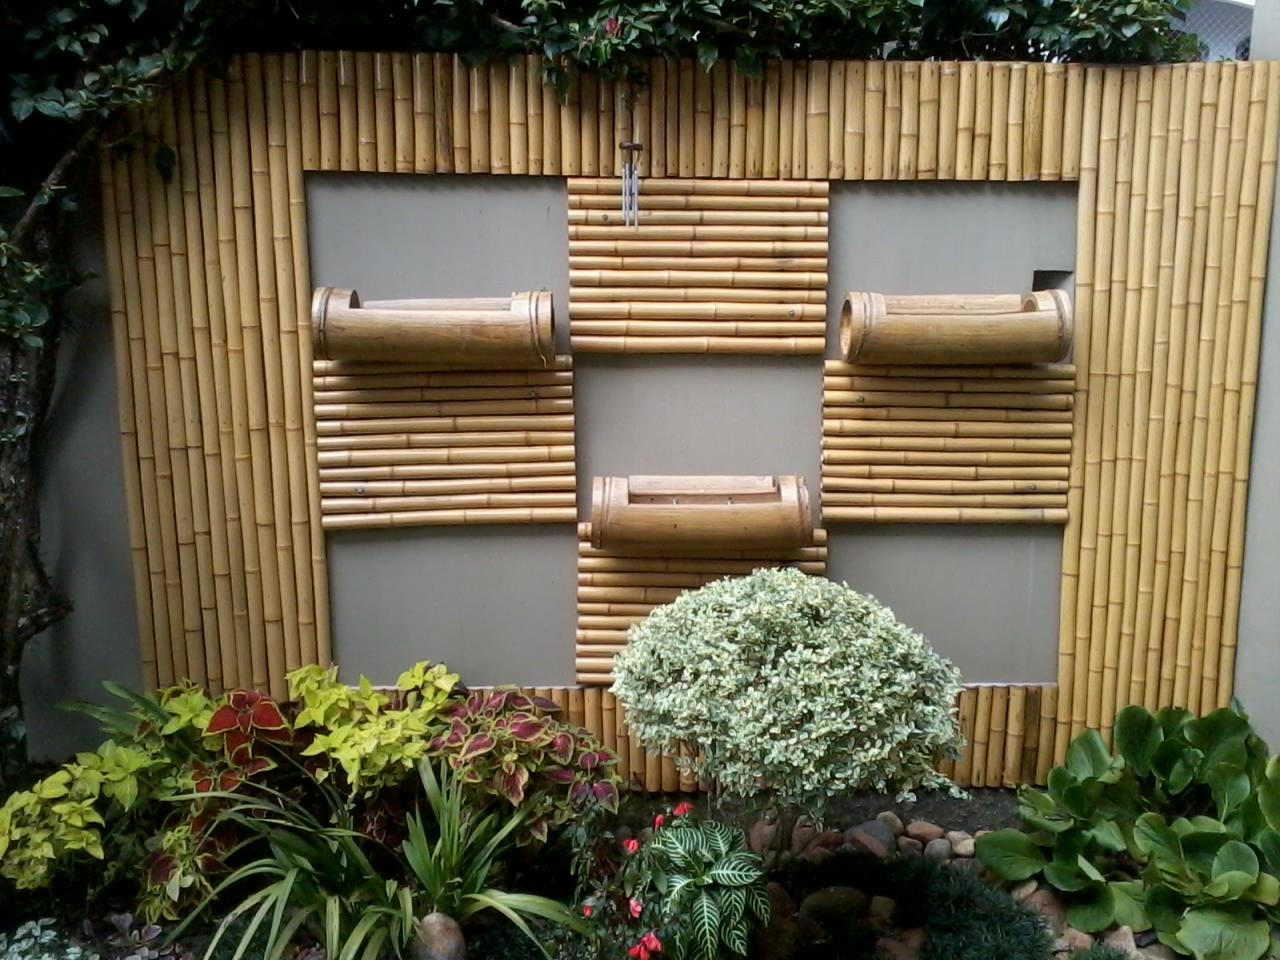 jardim vertical bambu : Vida Bambu - Curitiba - PR.: Jardim vertical em bambu